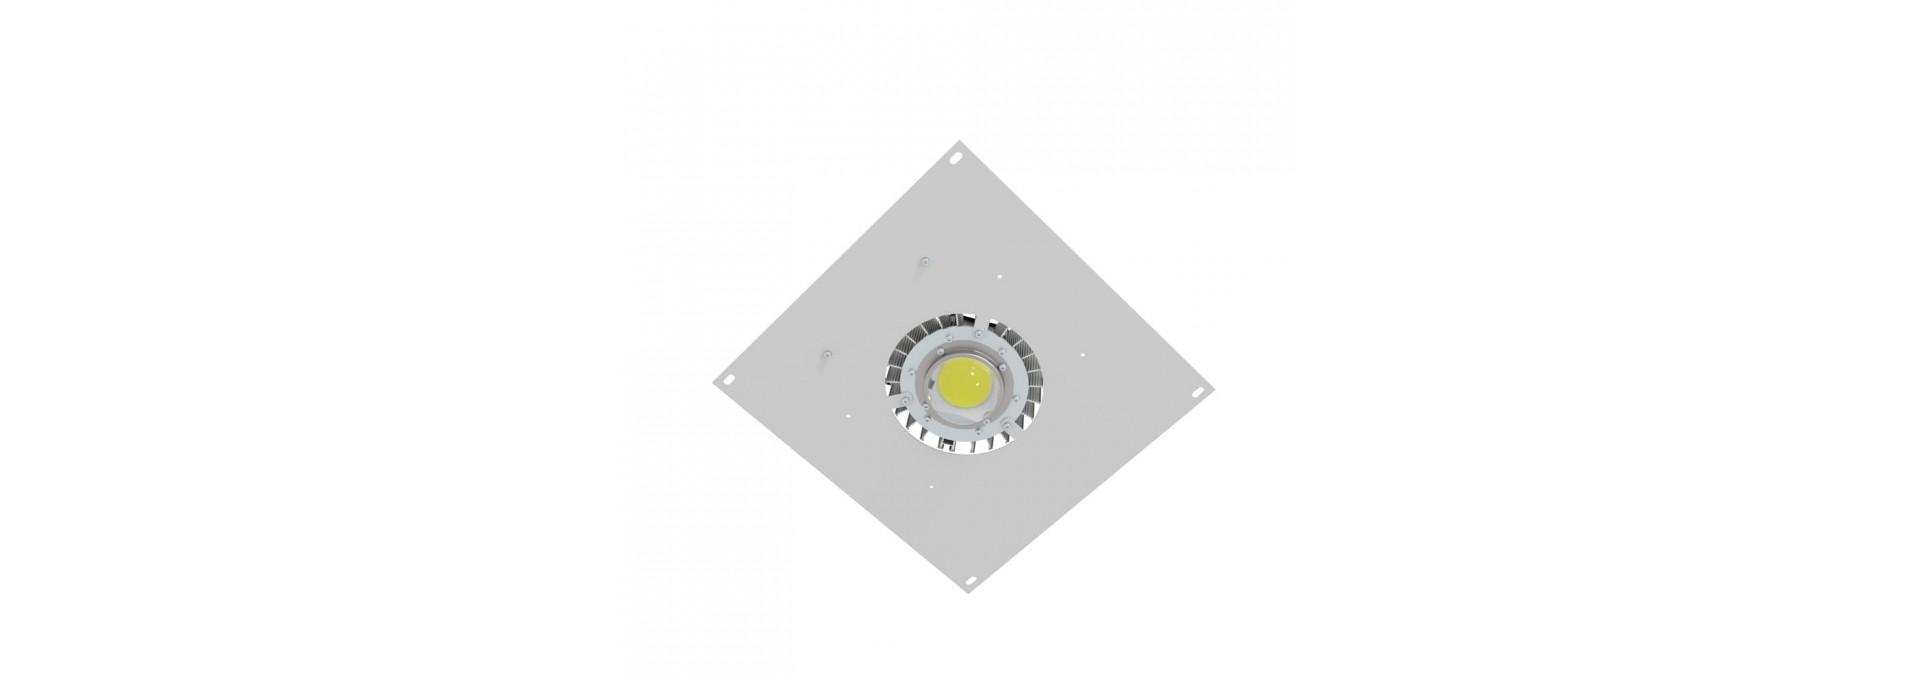 АЗС 50 Экстра 4500К 45°